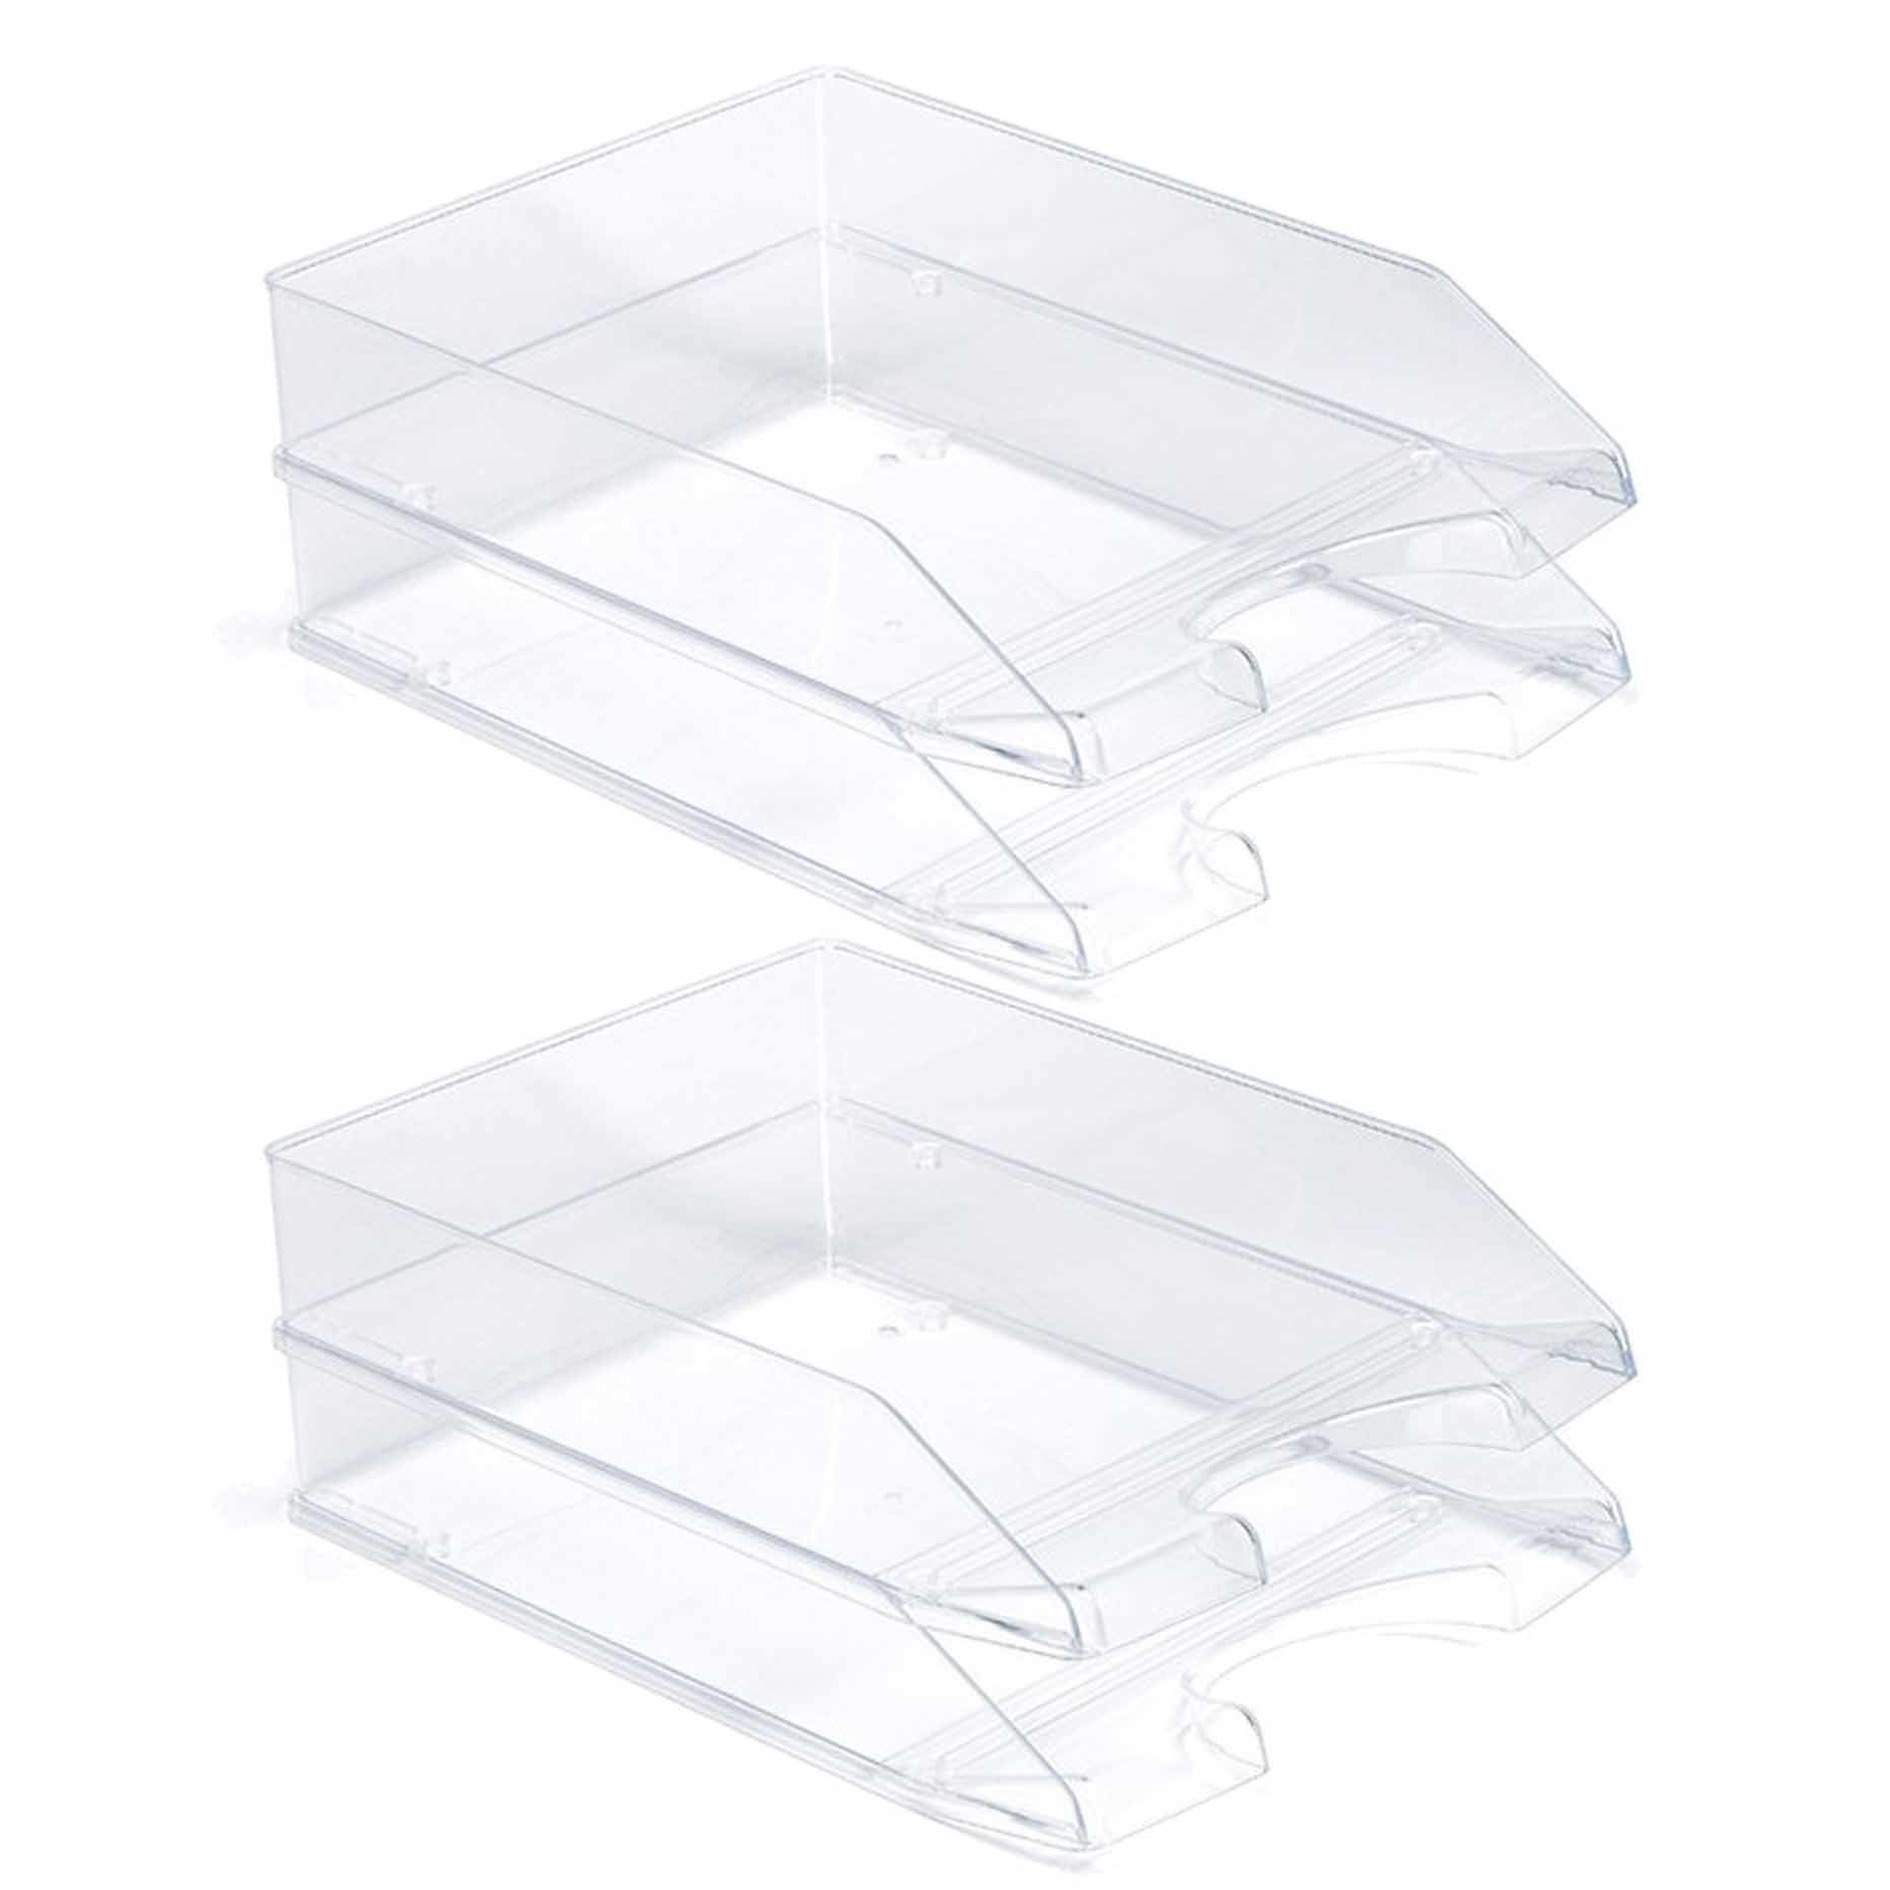 Pakket van 5x stuks postbakjejes transparant a4 formaat